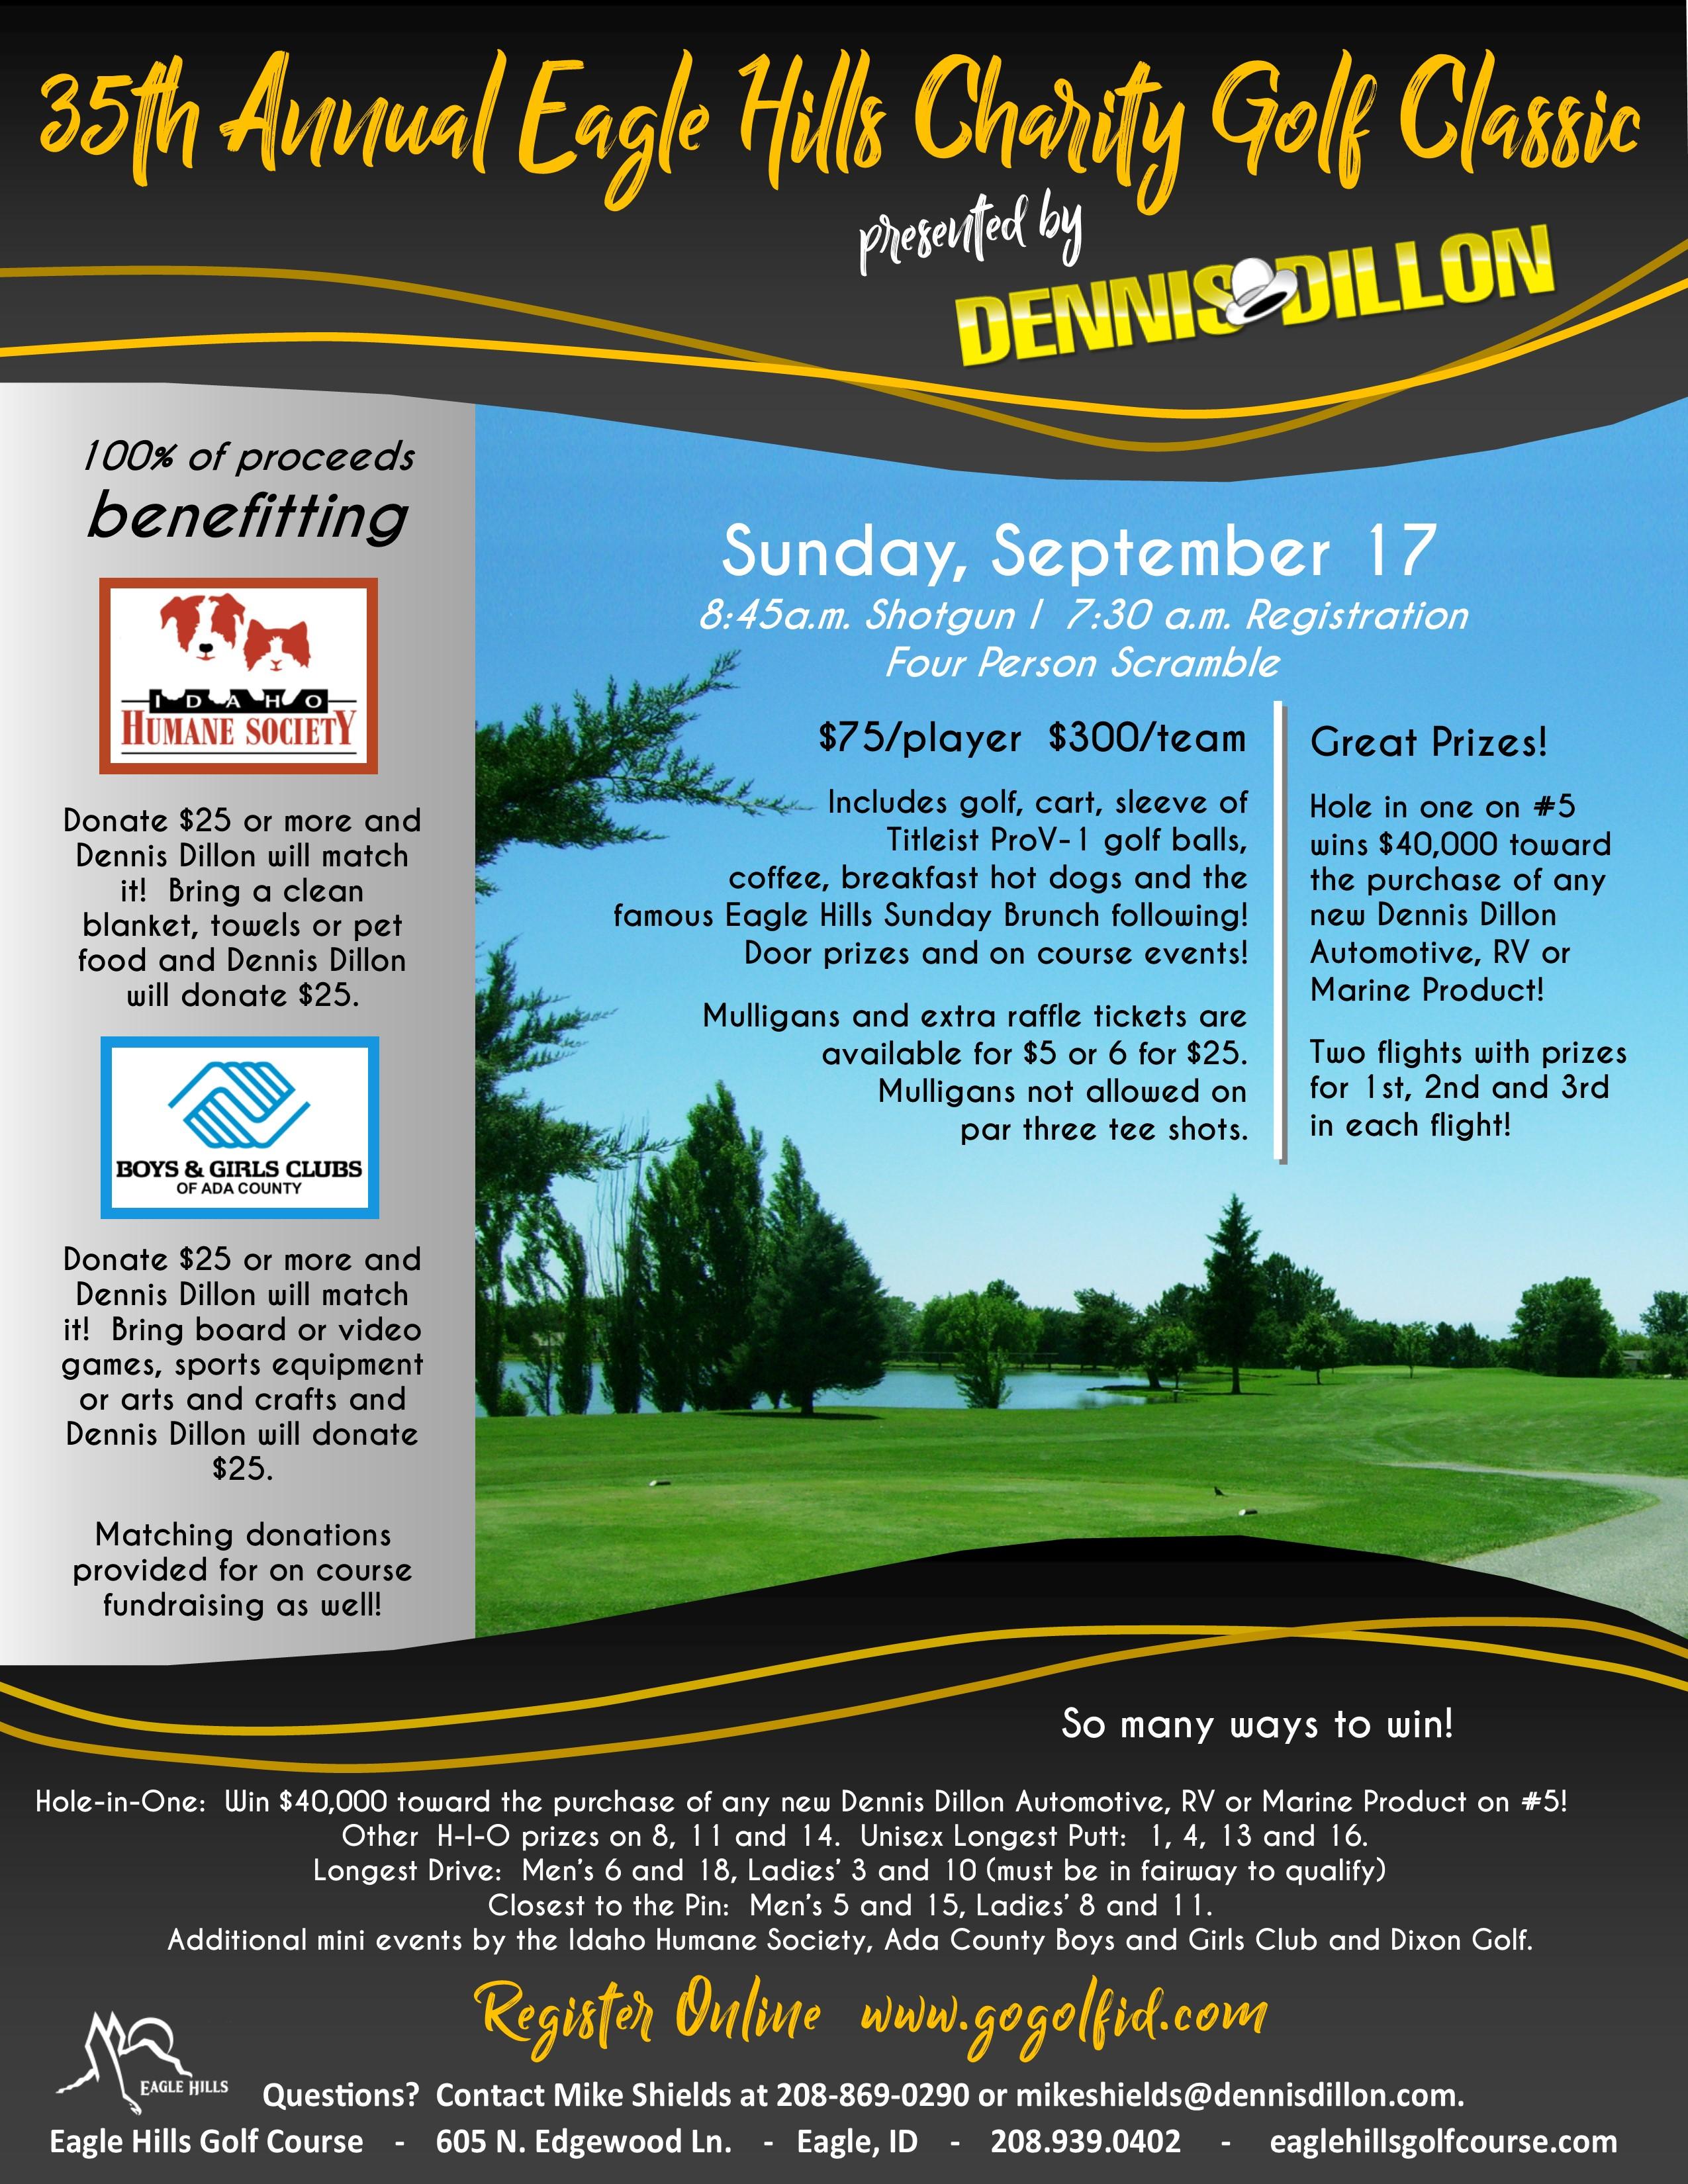 Dennis Dillon Logo >> Ehgc Charity Golf Classic Presented By Dennis Dillon Eagle